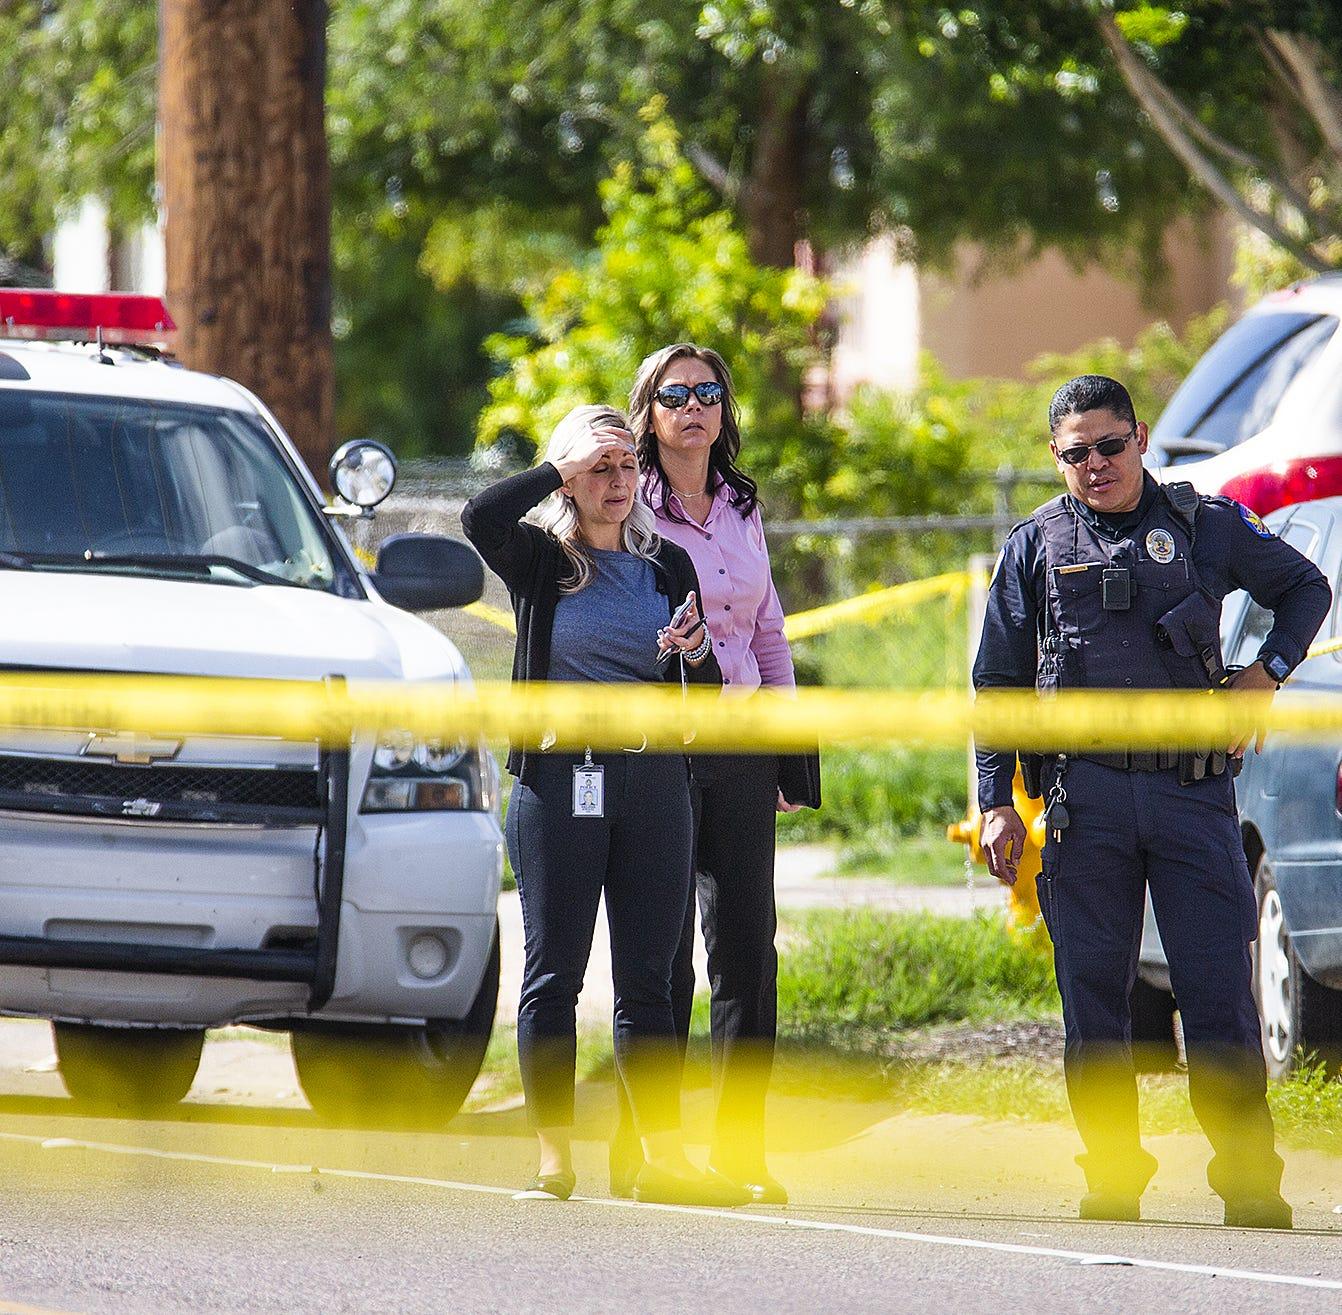 2 muertos, 4 heridos en tiroteo ocurrido en fiesta en la Avenida 27